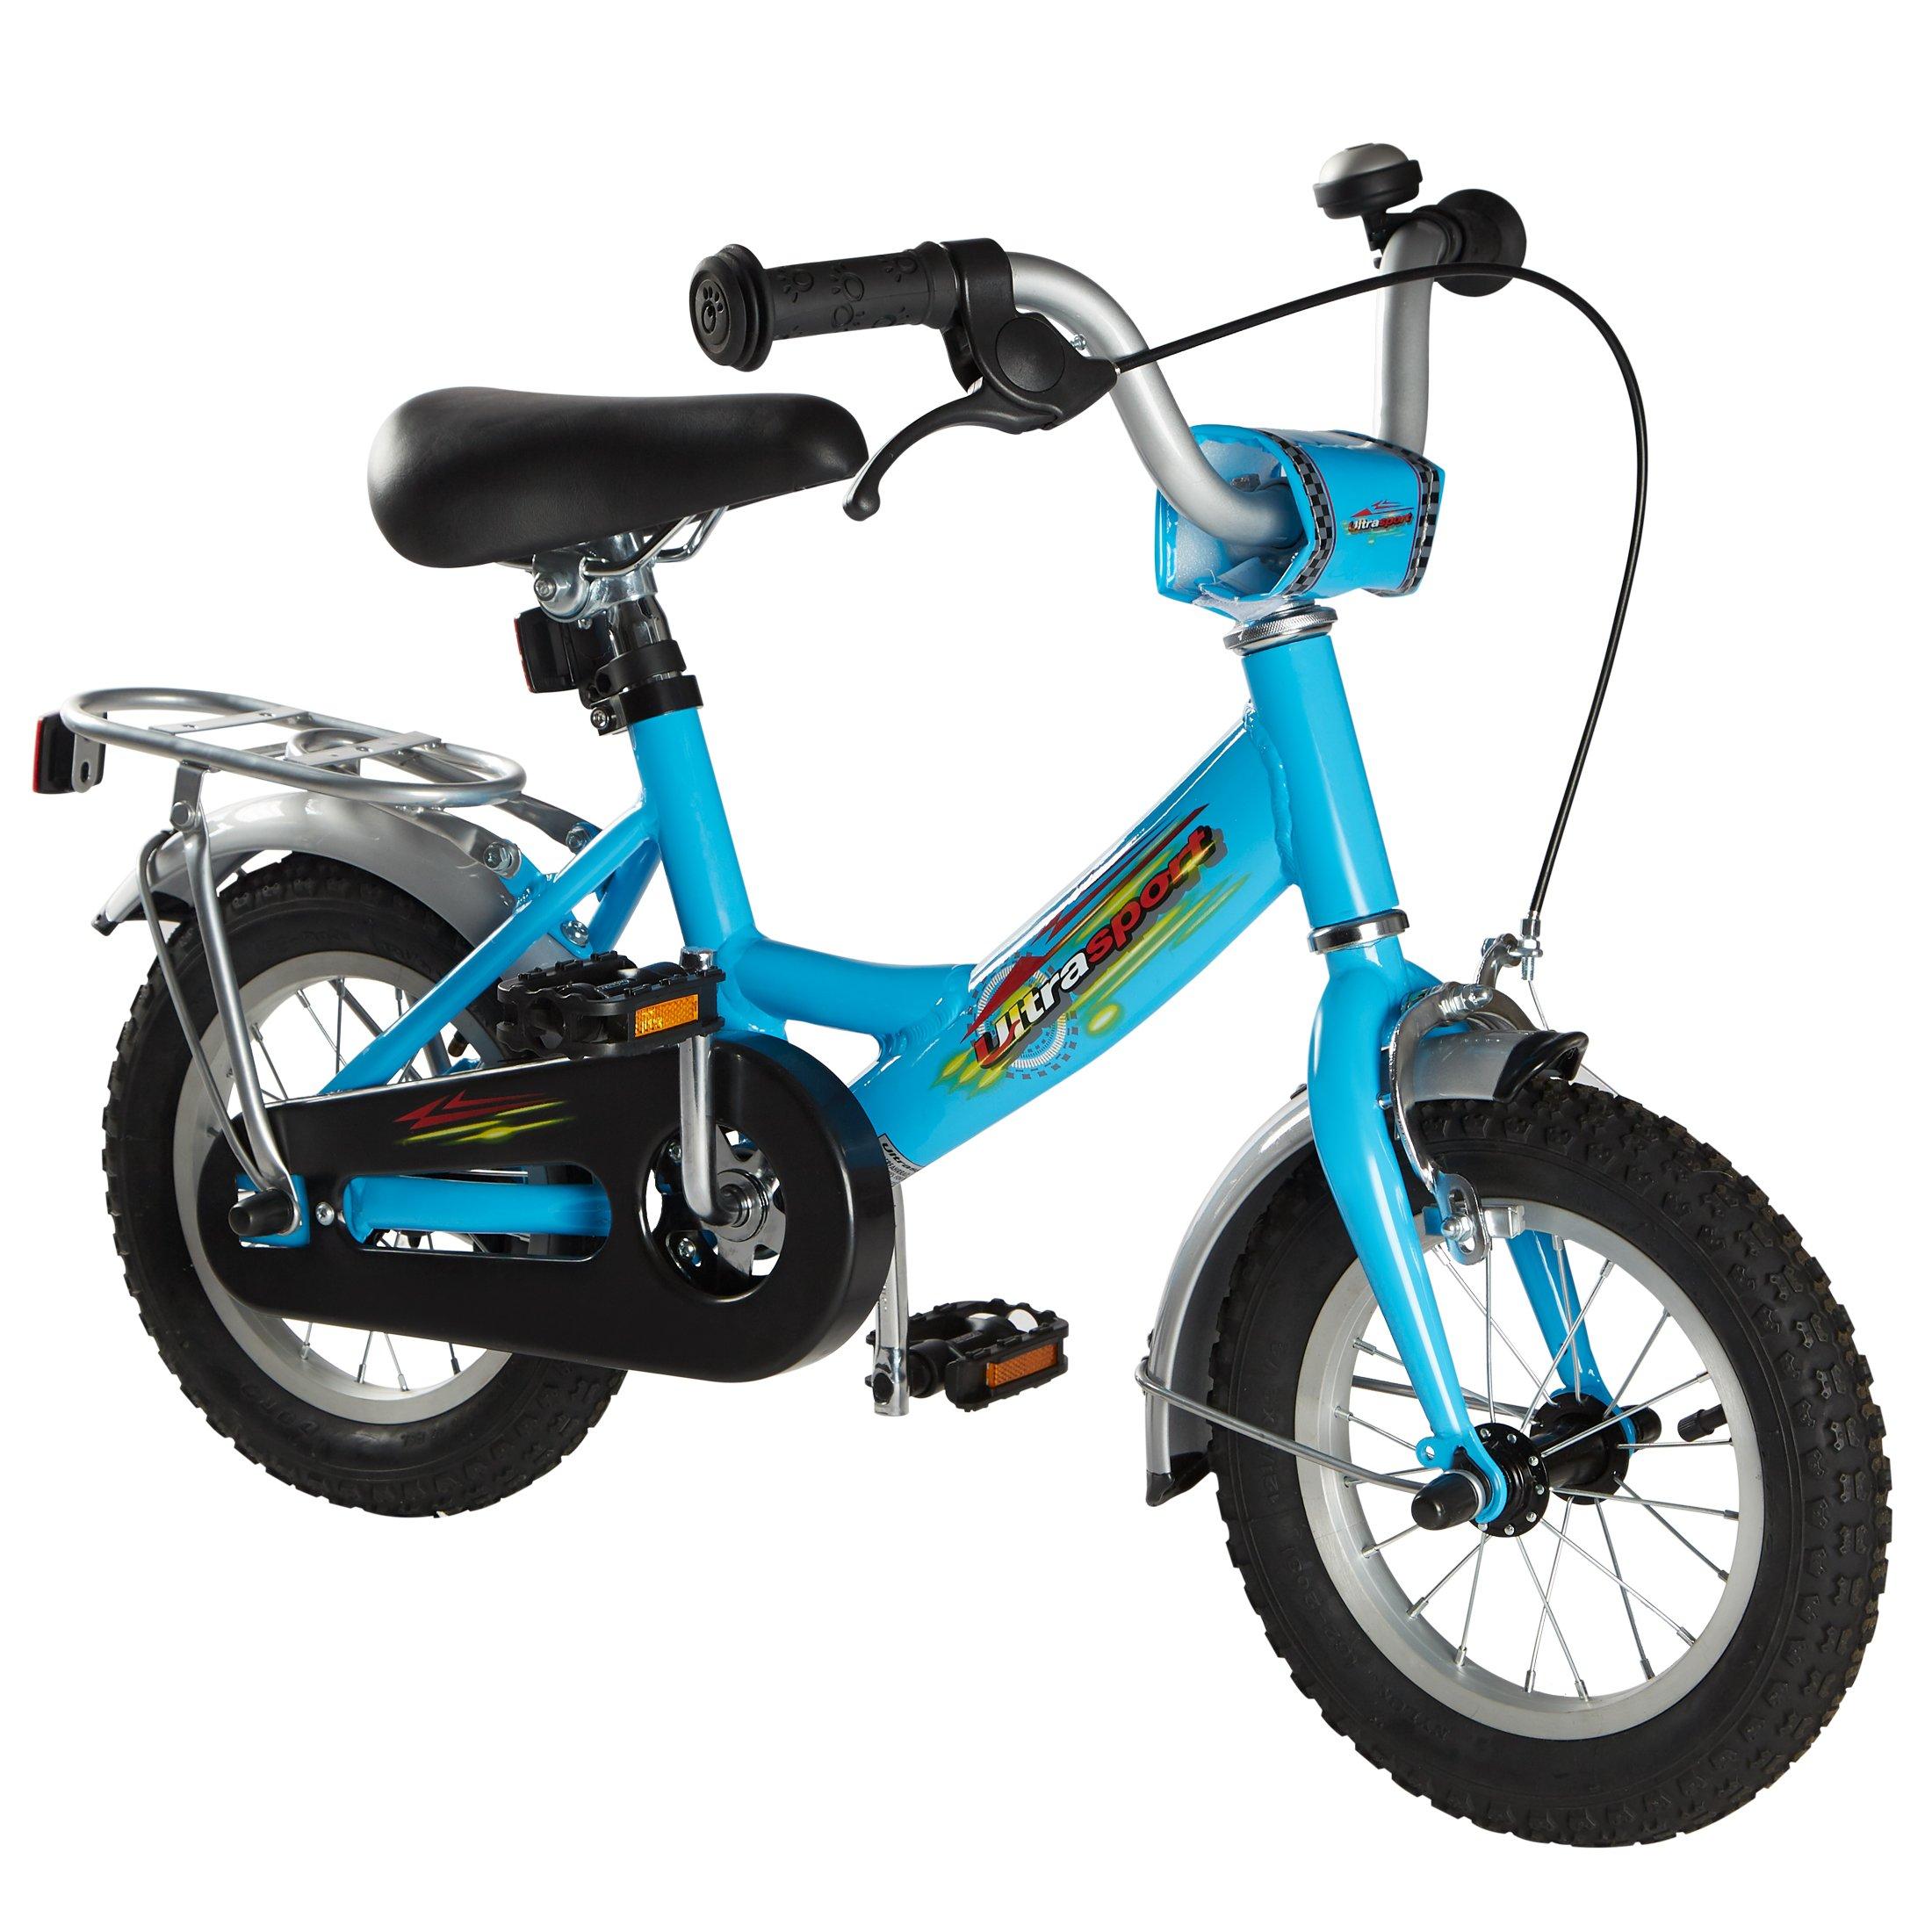 ultrasport kinderfahrrad fahrrad f r m dchen und jungen. Black Bedroom Furniture Sets. Home Design Ideas